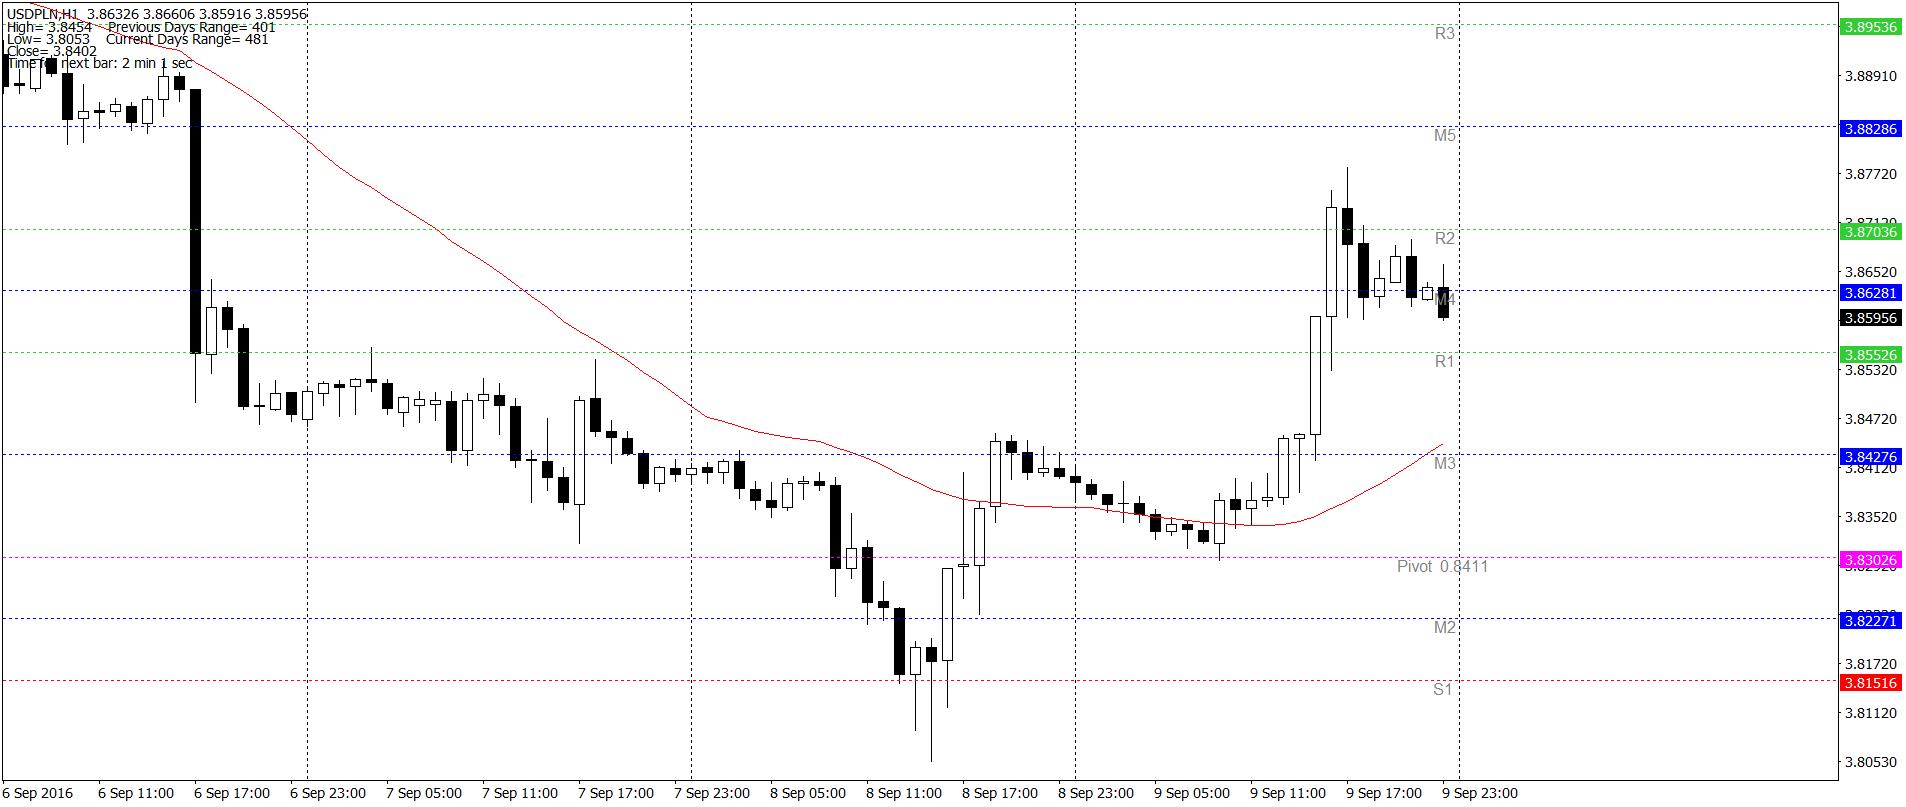 USD/PLN H1